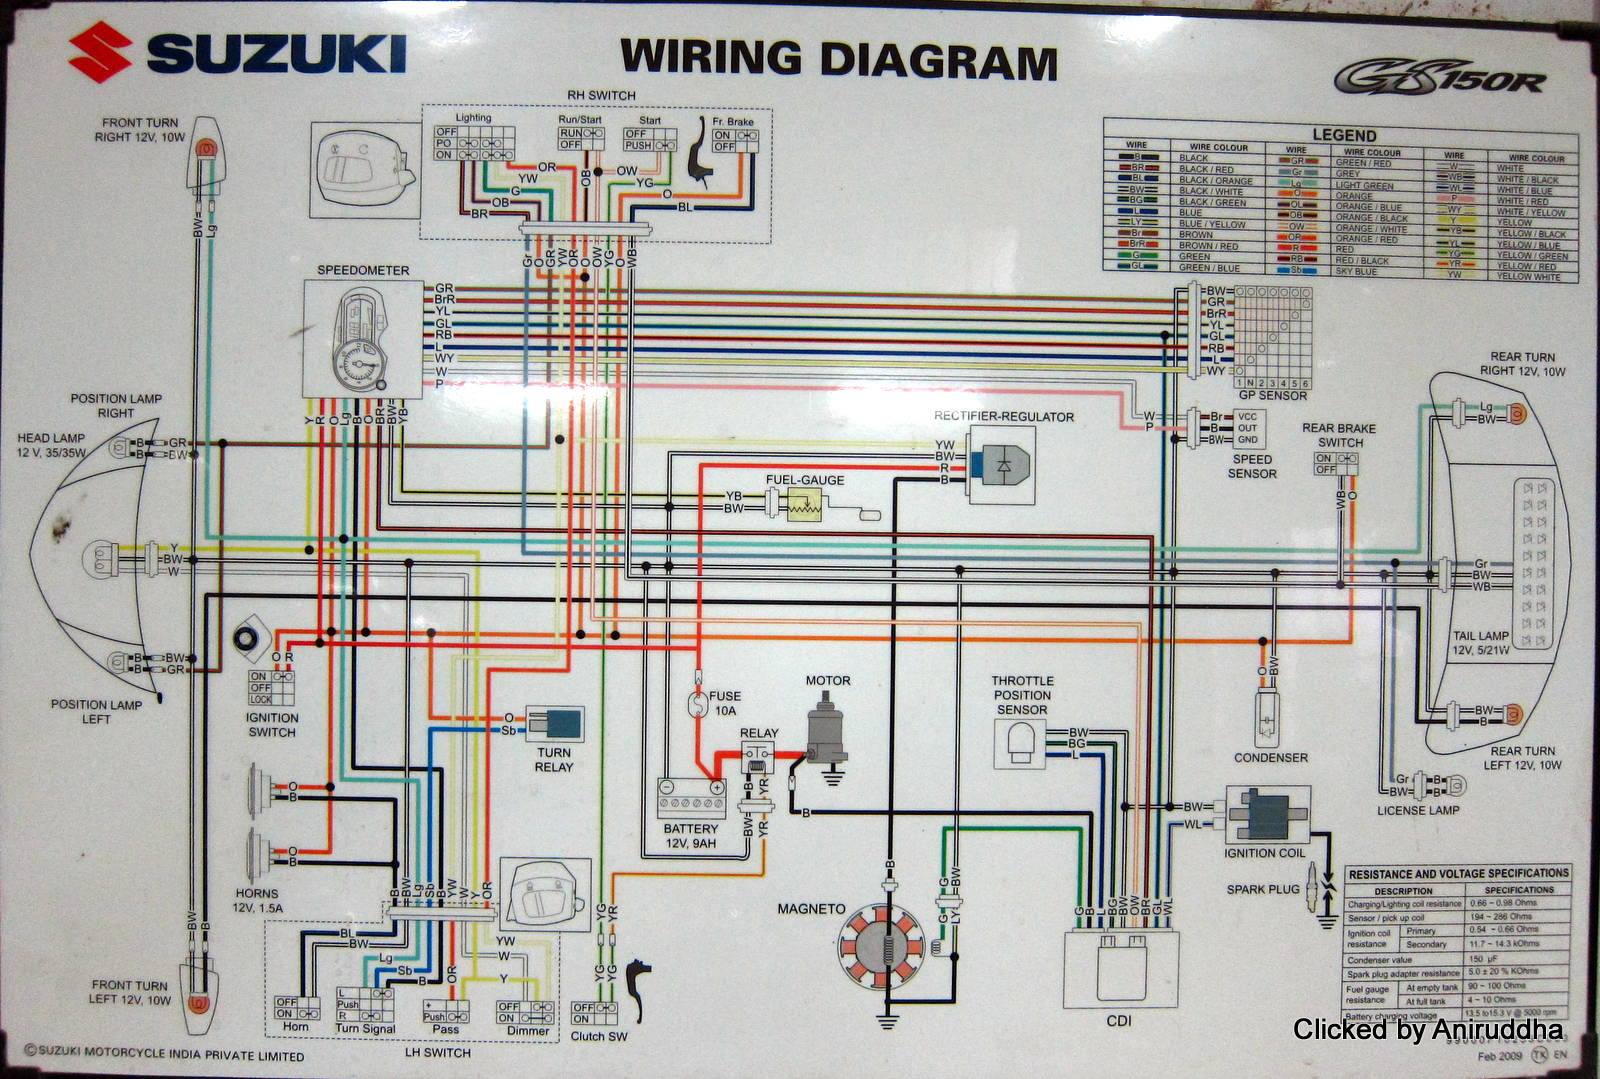 2009 Suzuki Xl7 Wiring Diagram 2005 Silverado Factory Stereo Wiring Bathroom Vents Yenpancane Jeanjaures37 Fr